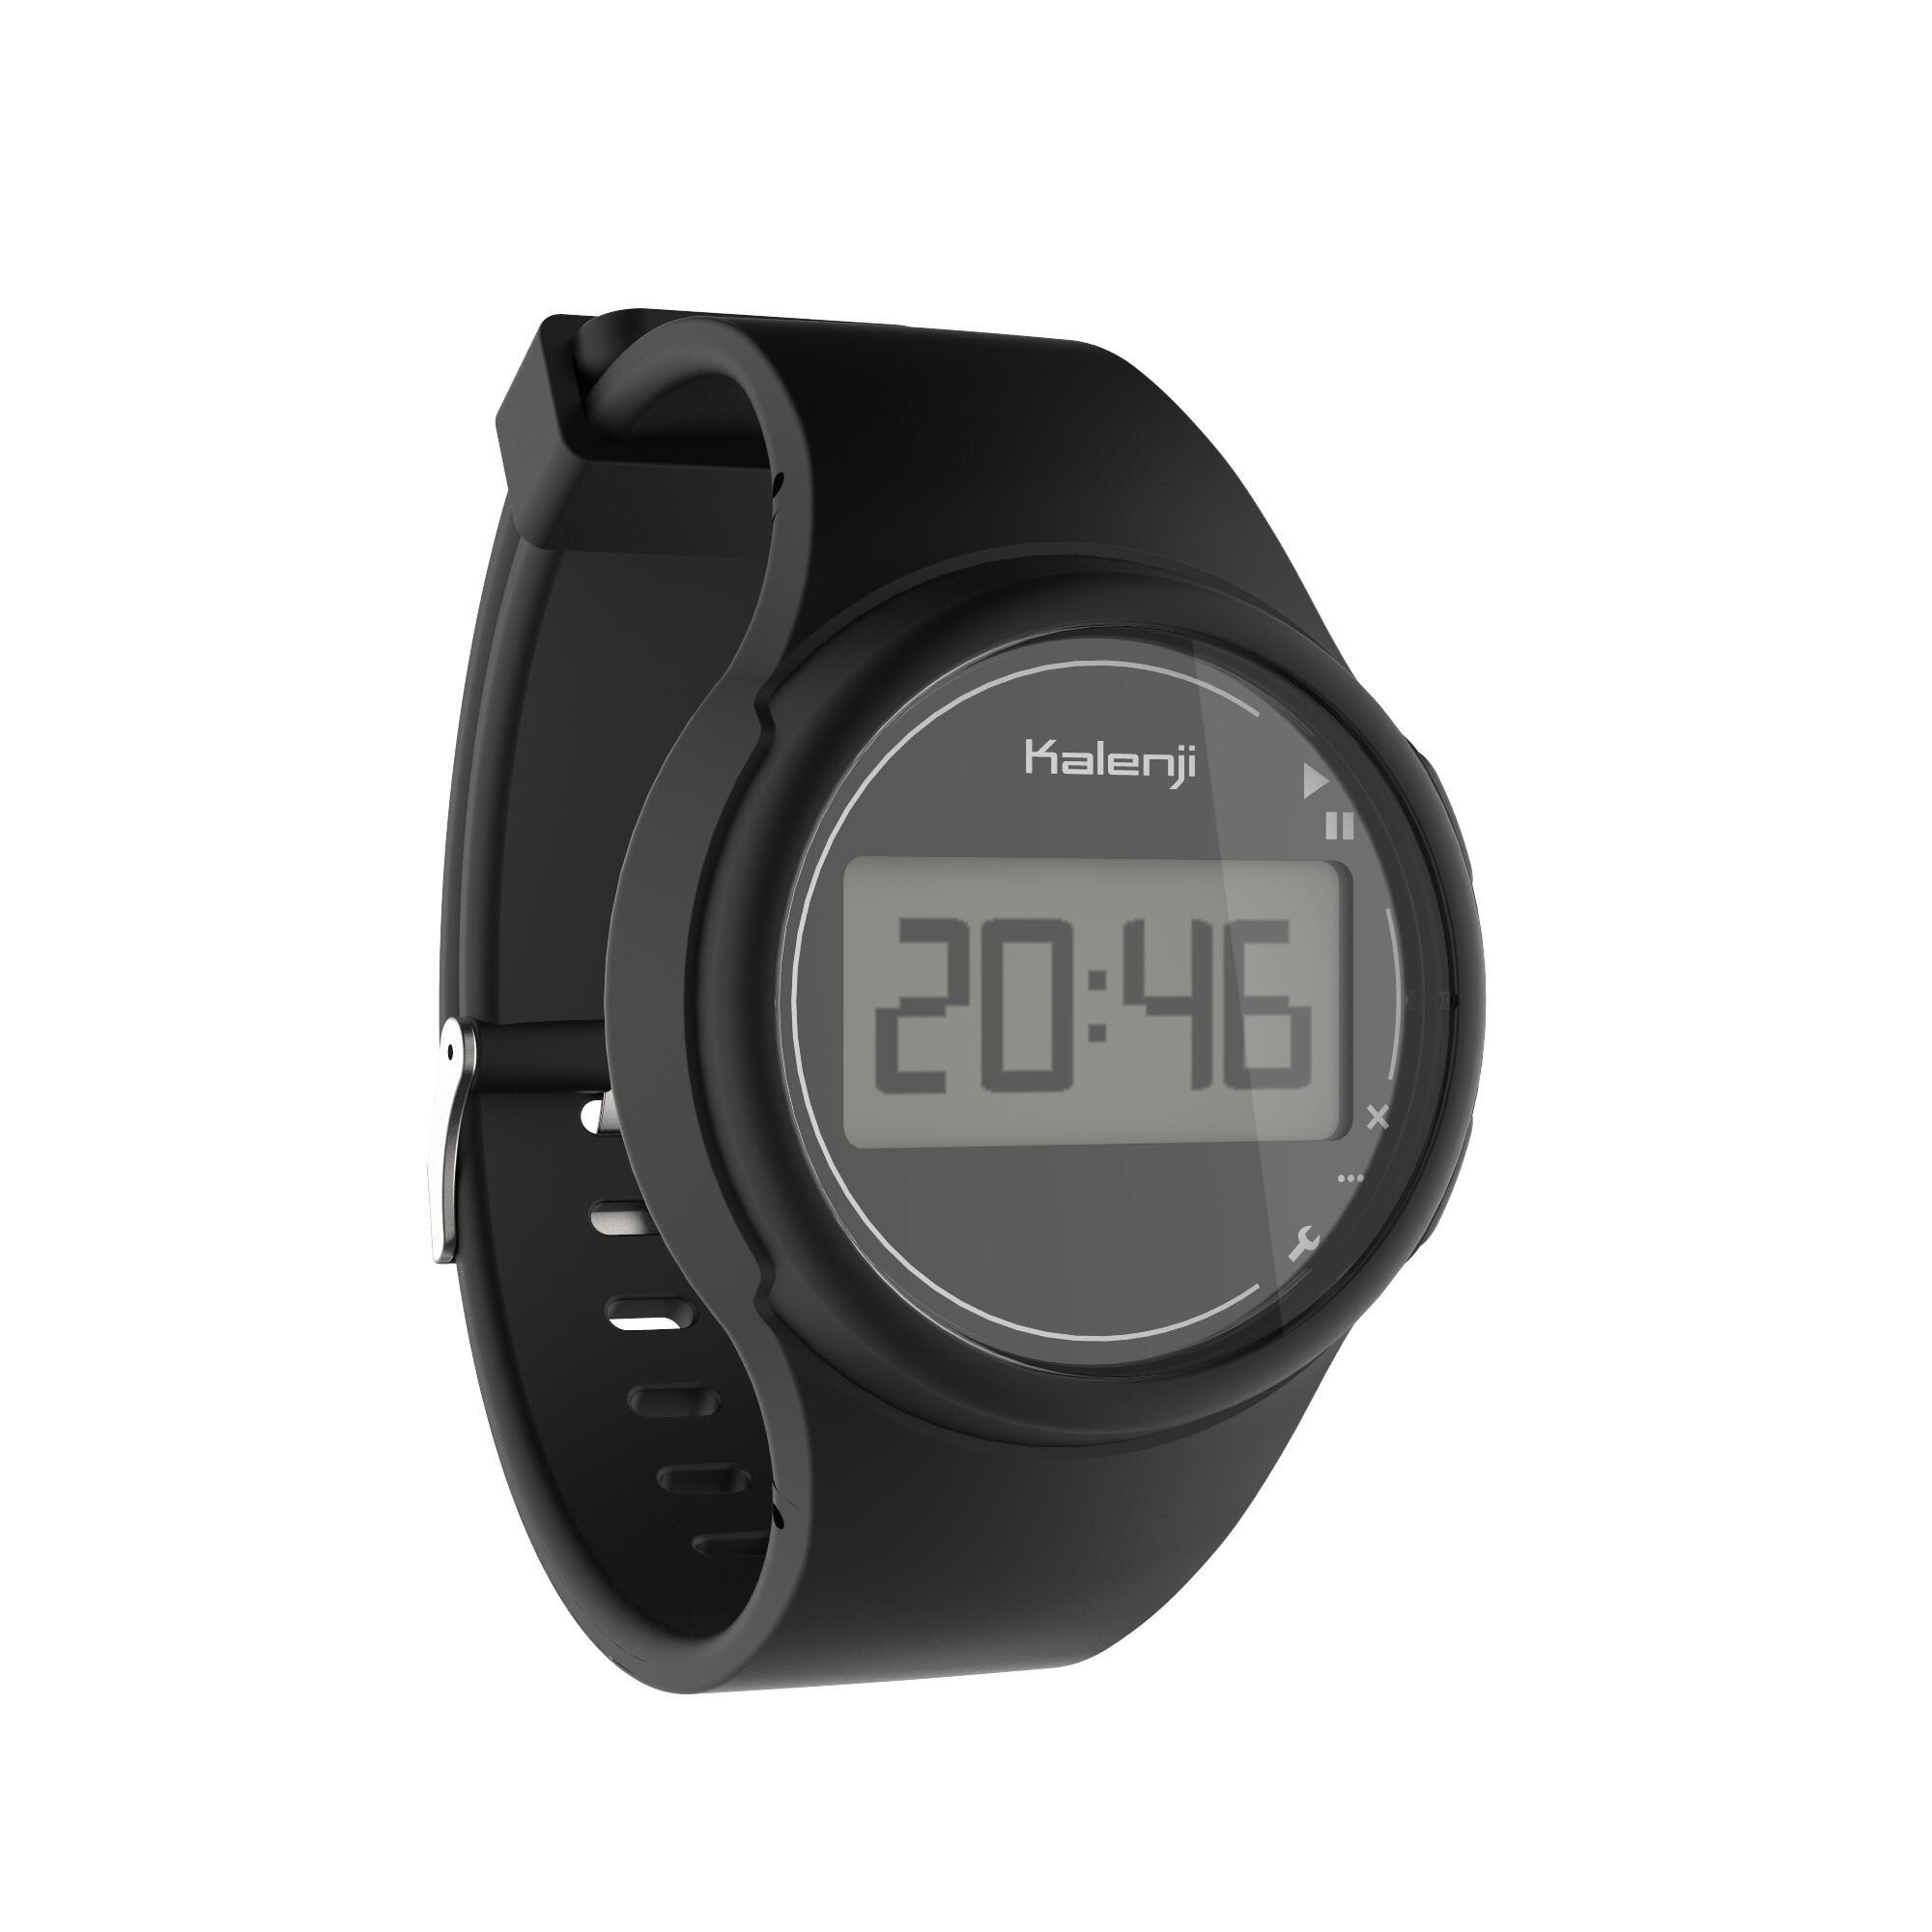 23e7c37ec32 Kalenji Sporthorloge stopwatch heren W100 M zwart | Decathlon